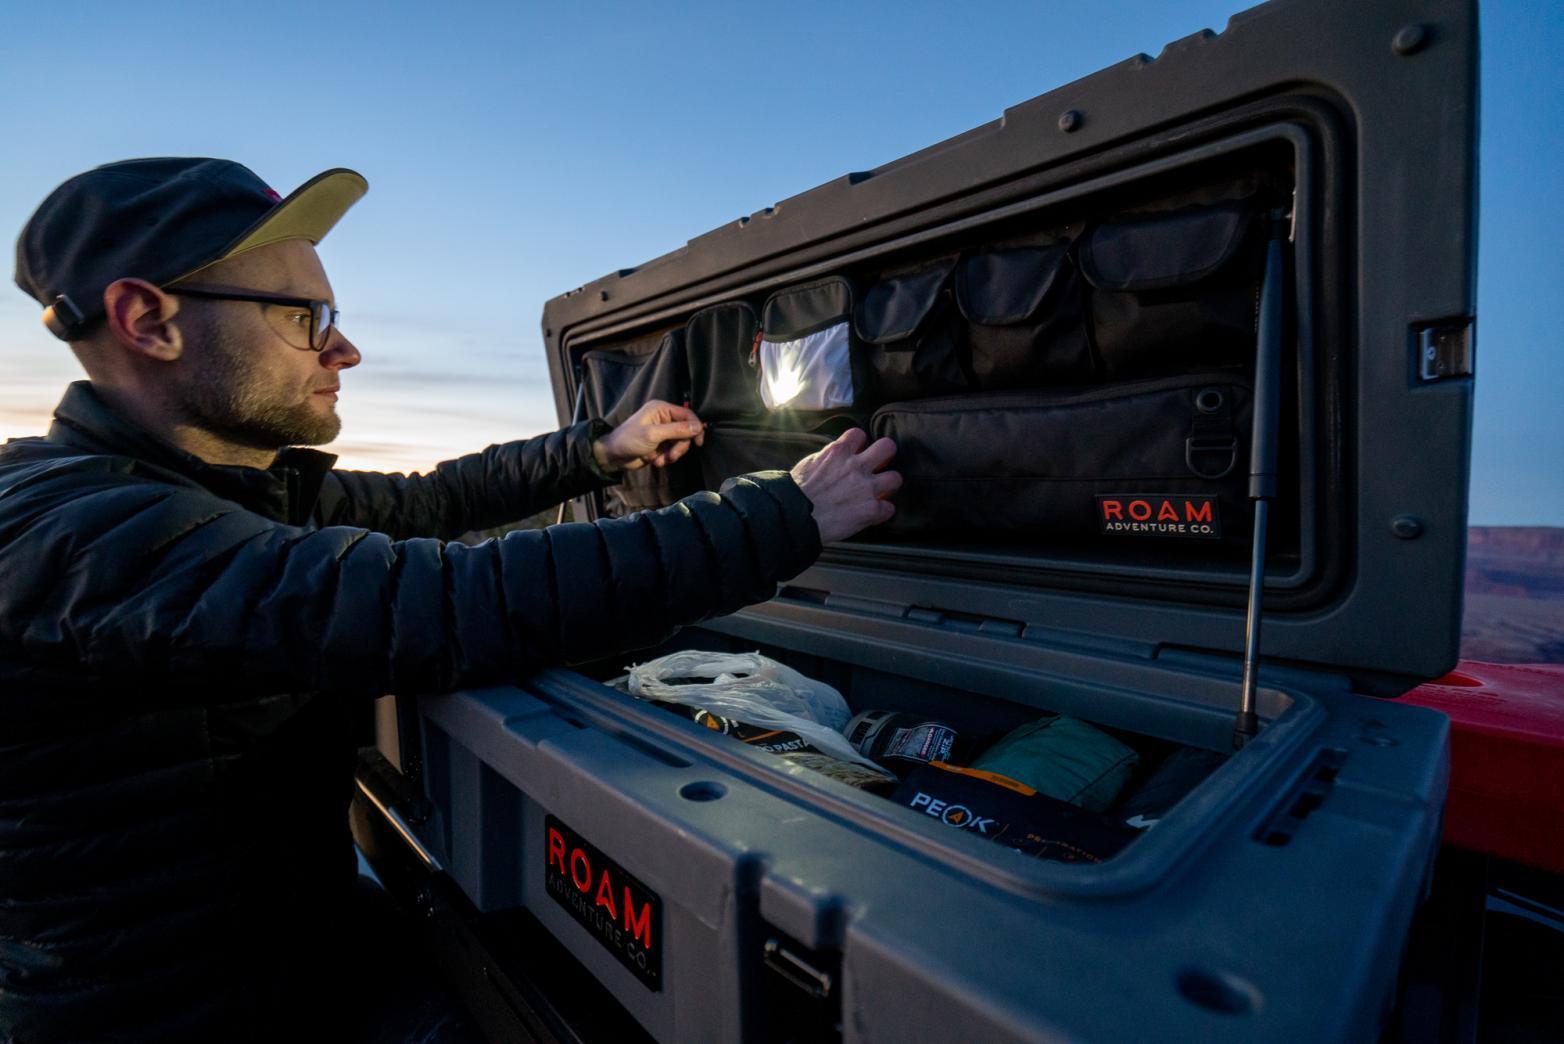 ROAM Rugged Case Lid Organizer - For A Better Base Camp-moab_december_kd20_-47-jpg